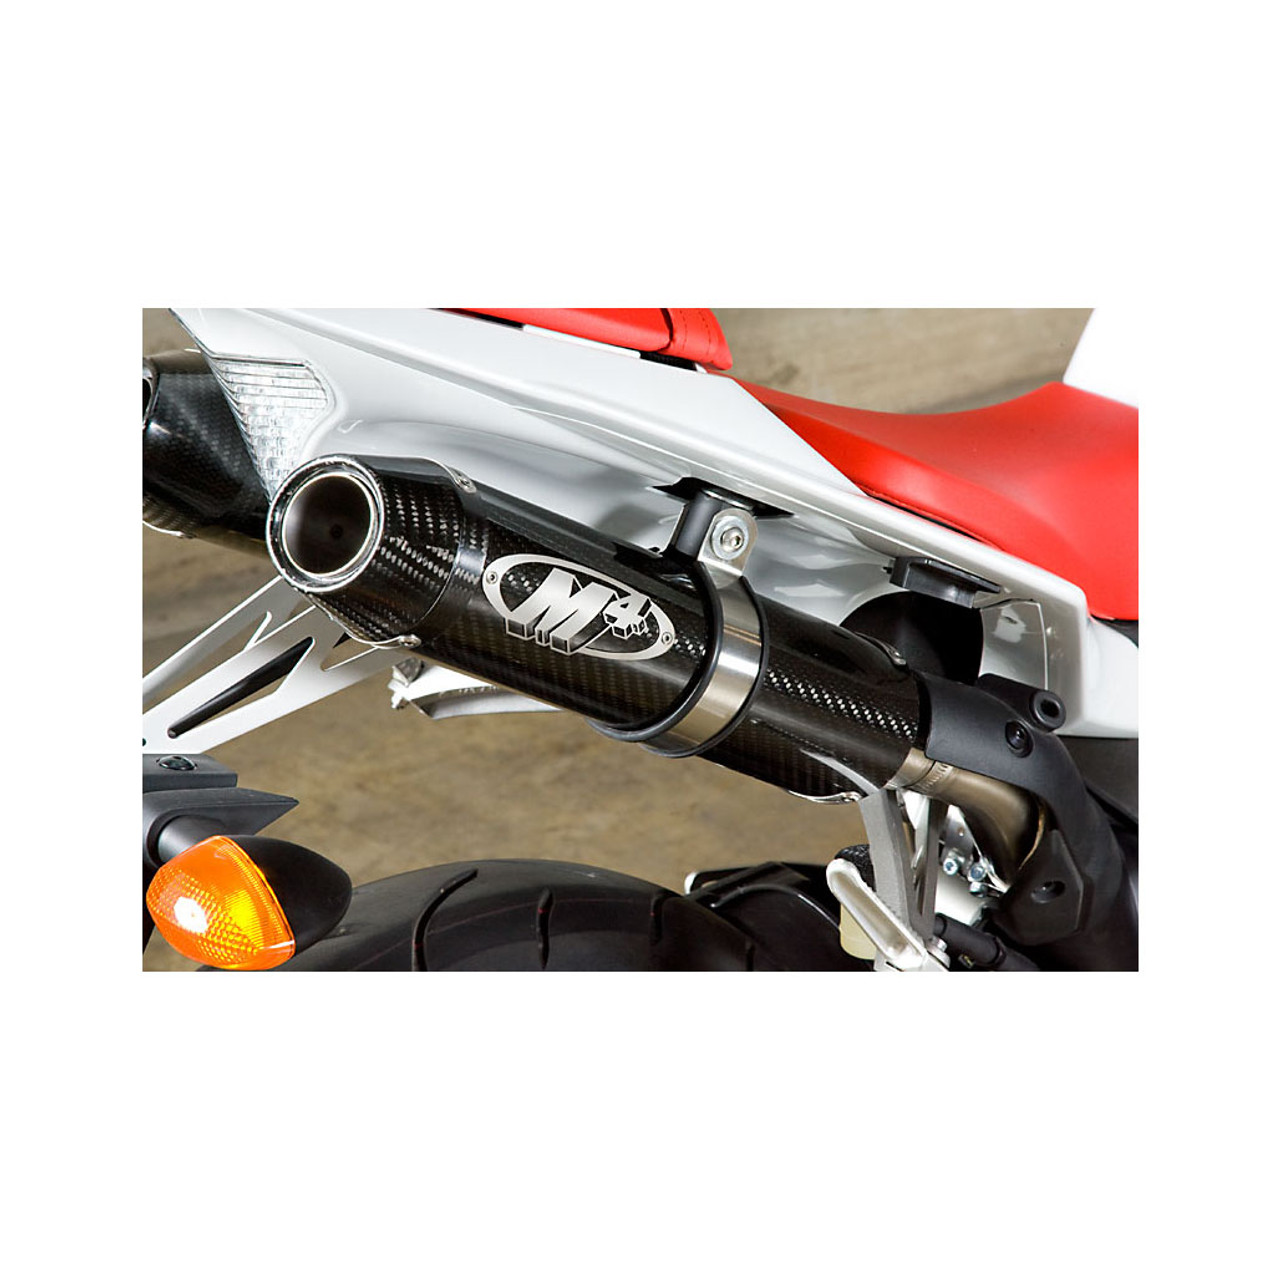 M4 Carbon Fiber Slip-on W/ Catalytic Converter Elim. 2009-2014 R1 YA9934